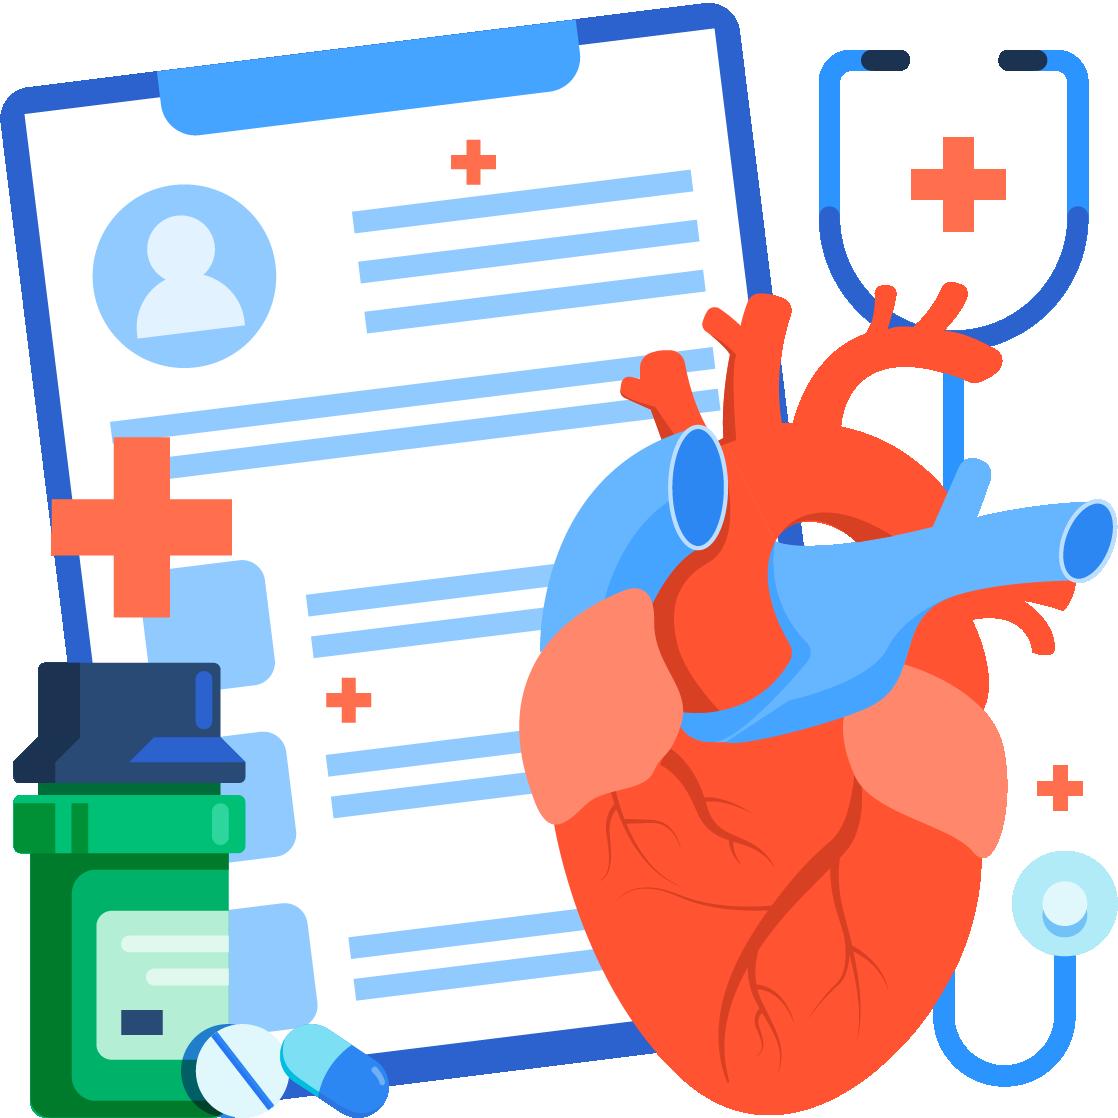 Cardiovascular risk screener